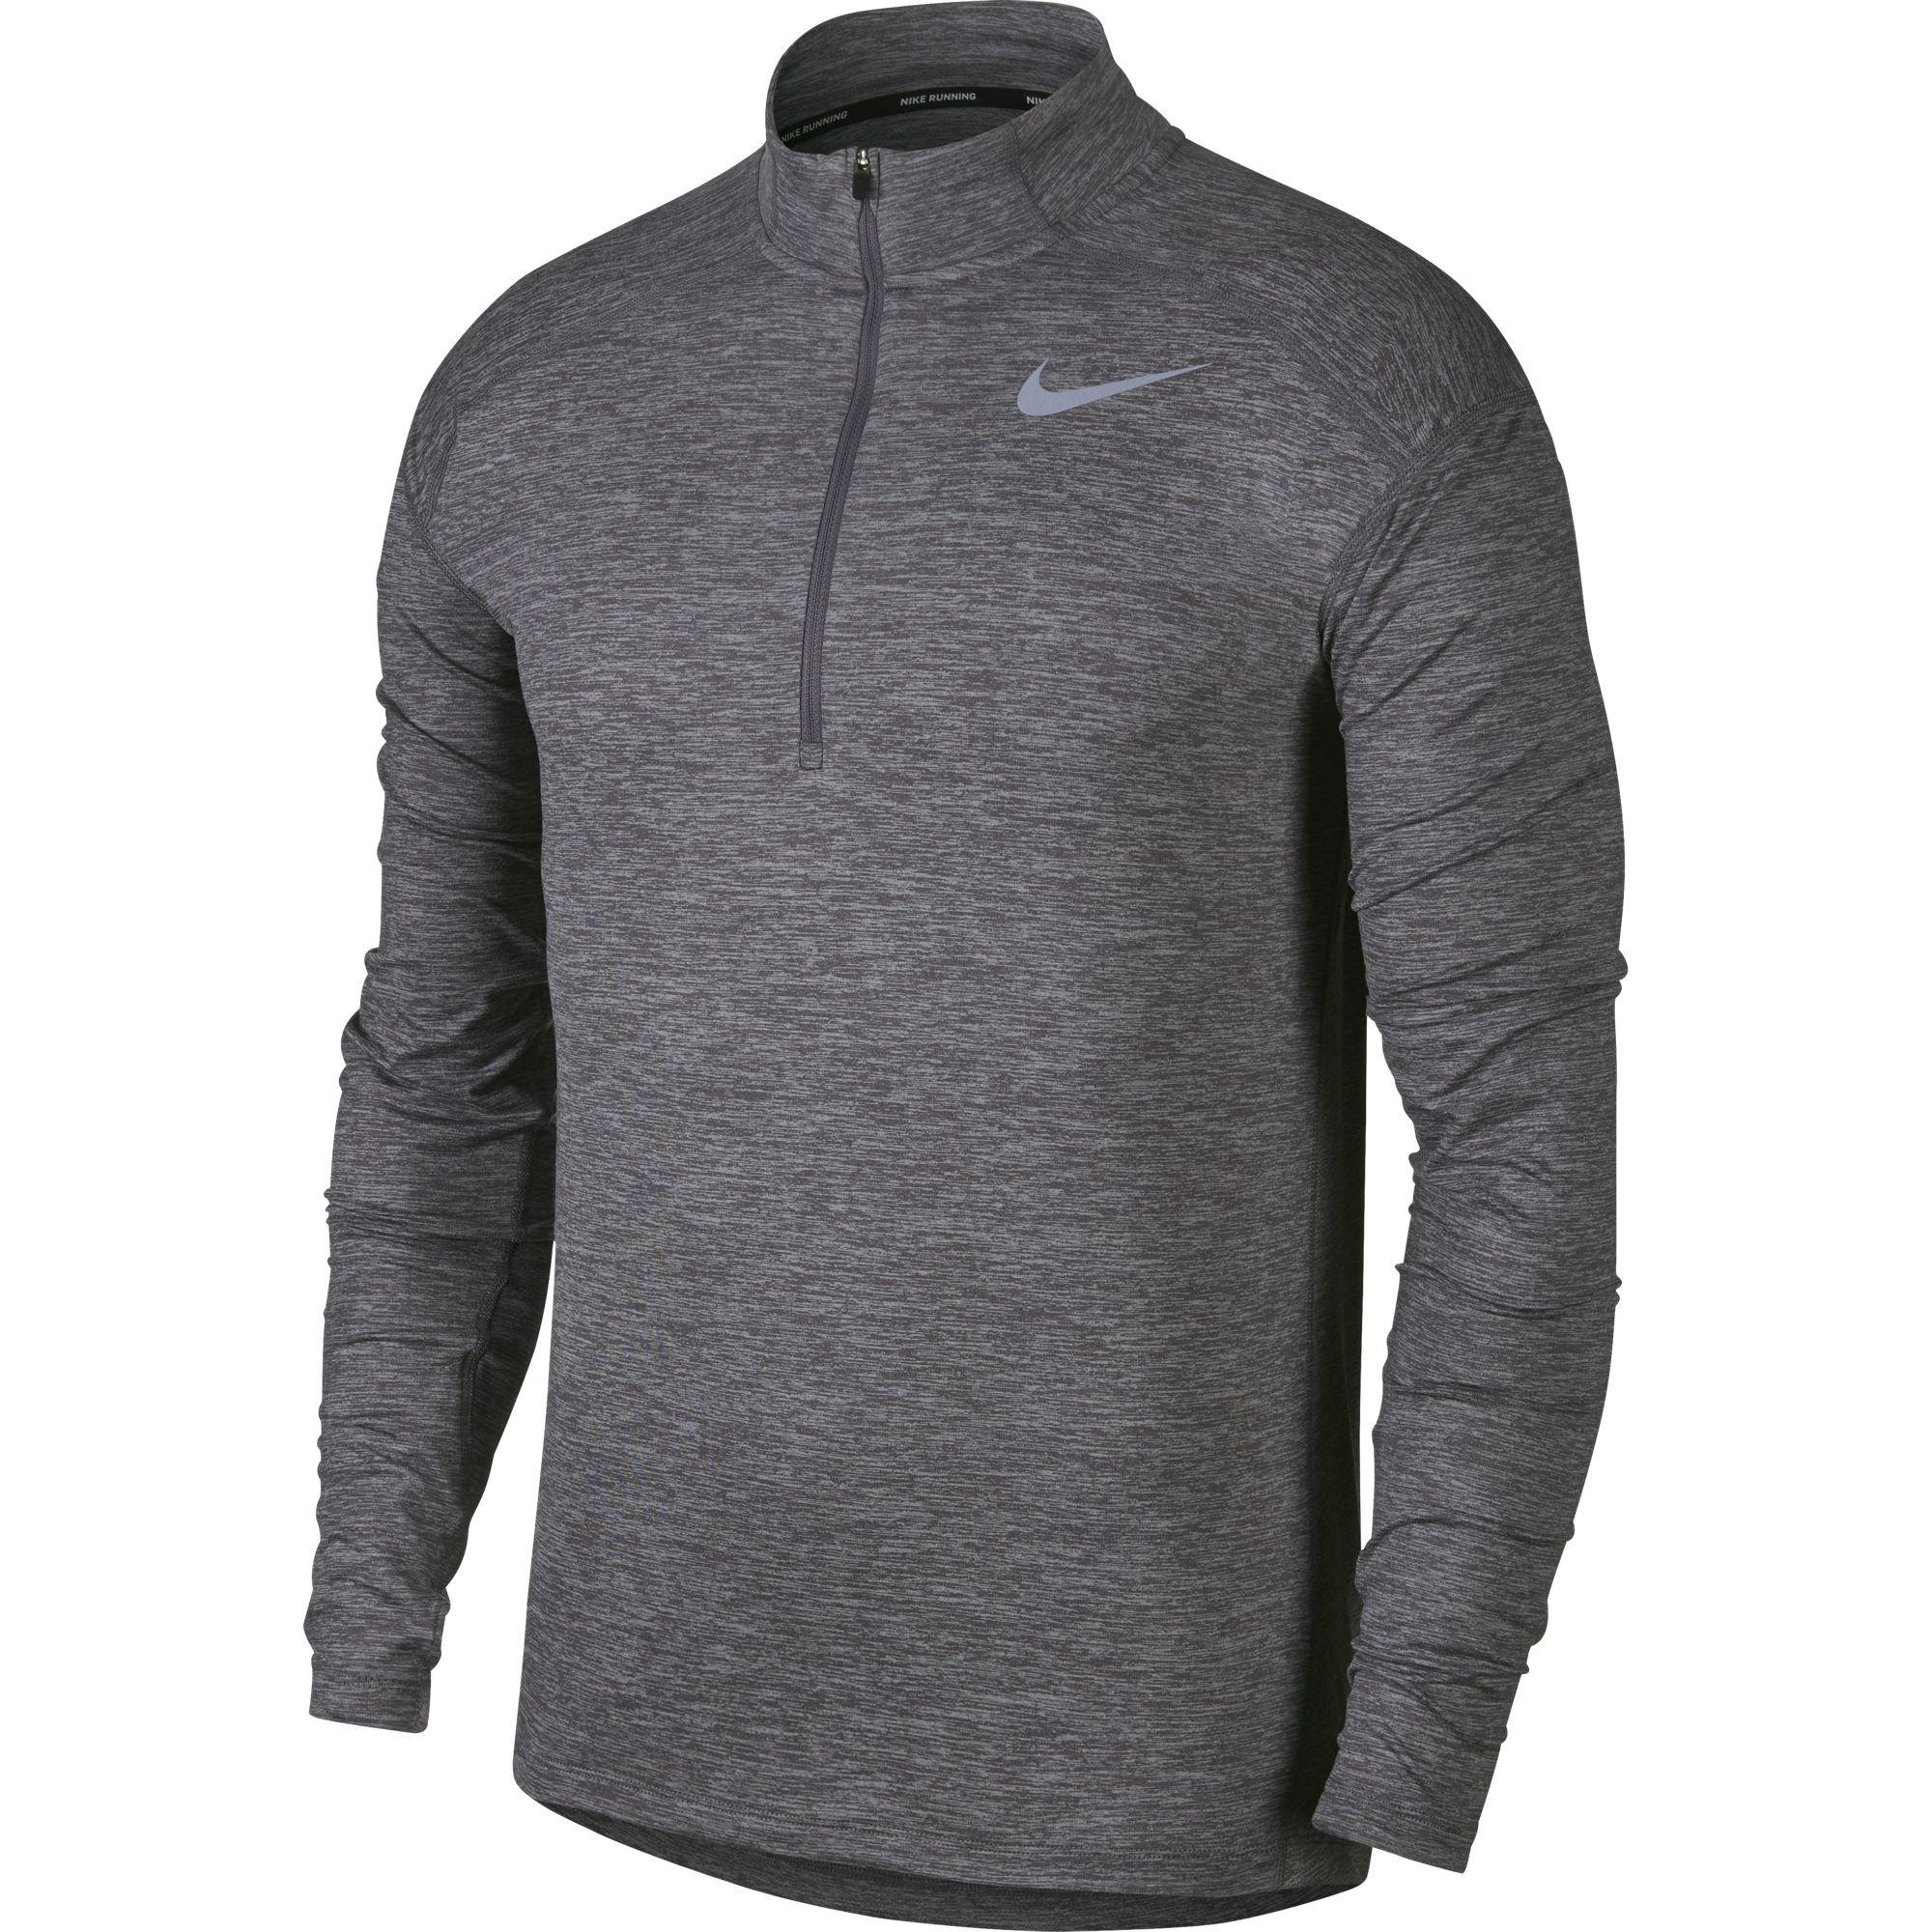 Nike Men's Dry Element Running Top Gunsmoke/Atmosphere Grey/Heather Size Medium